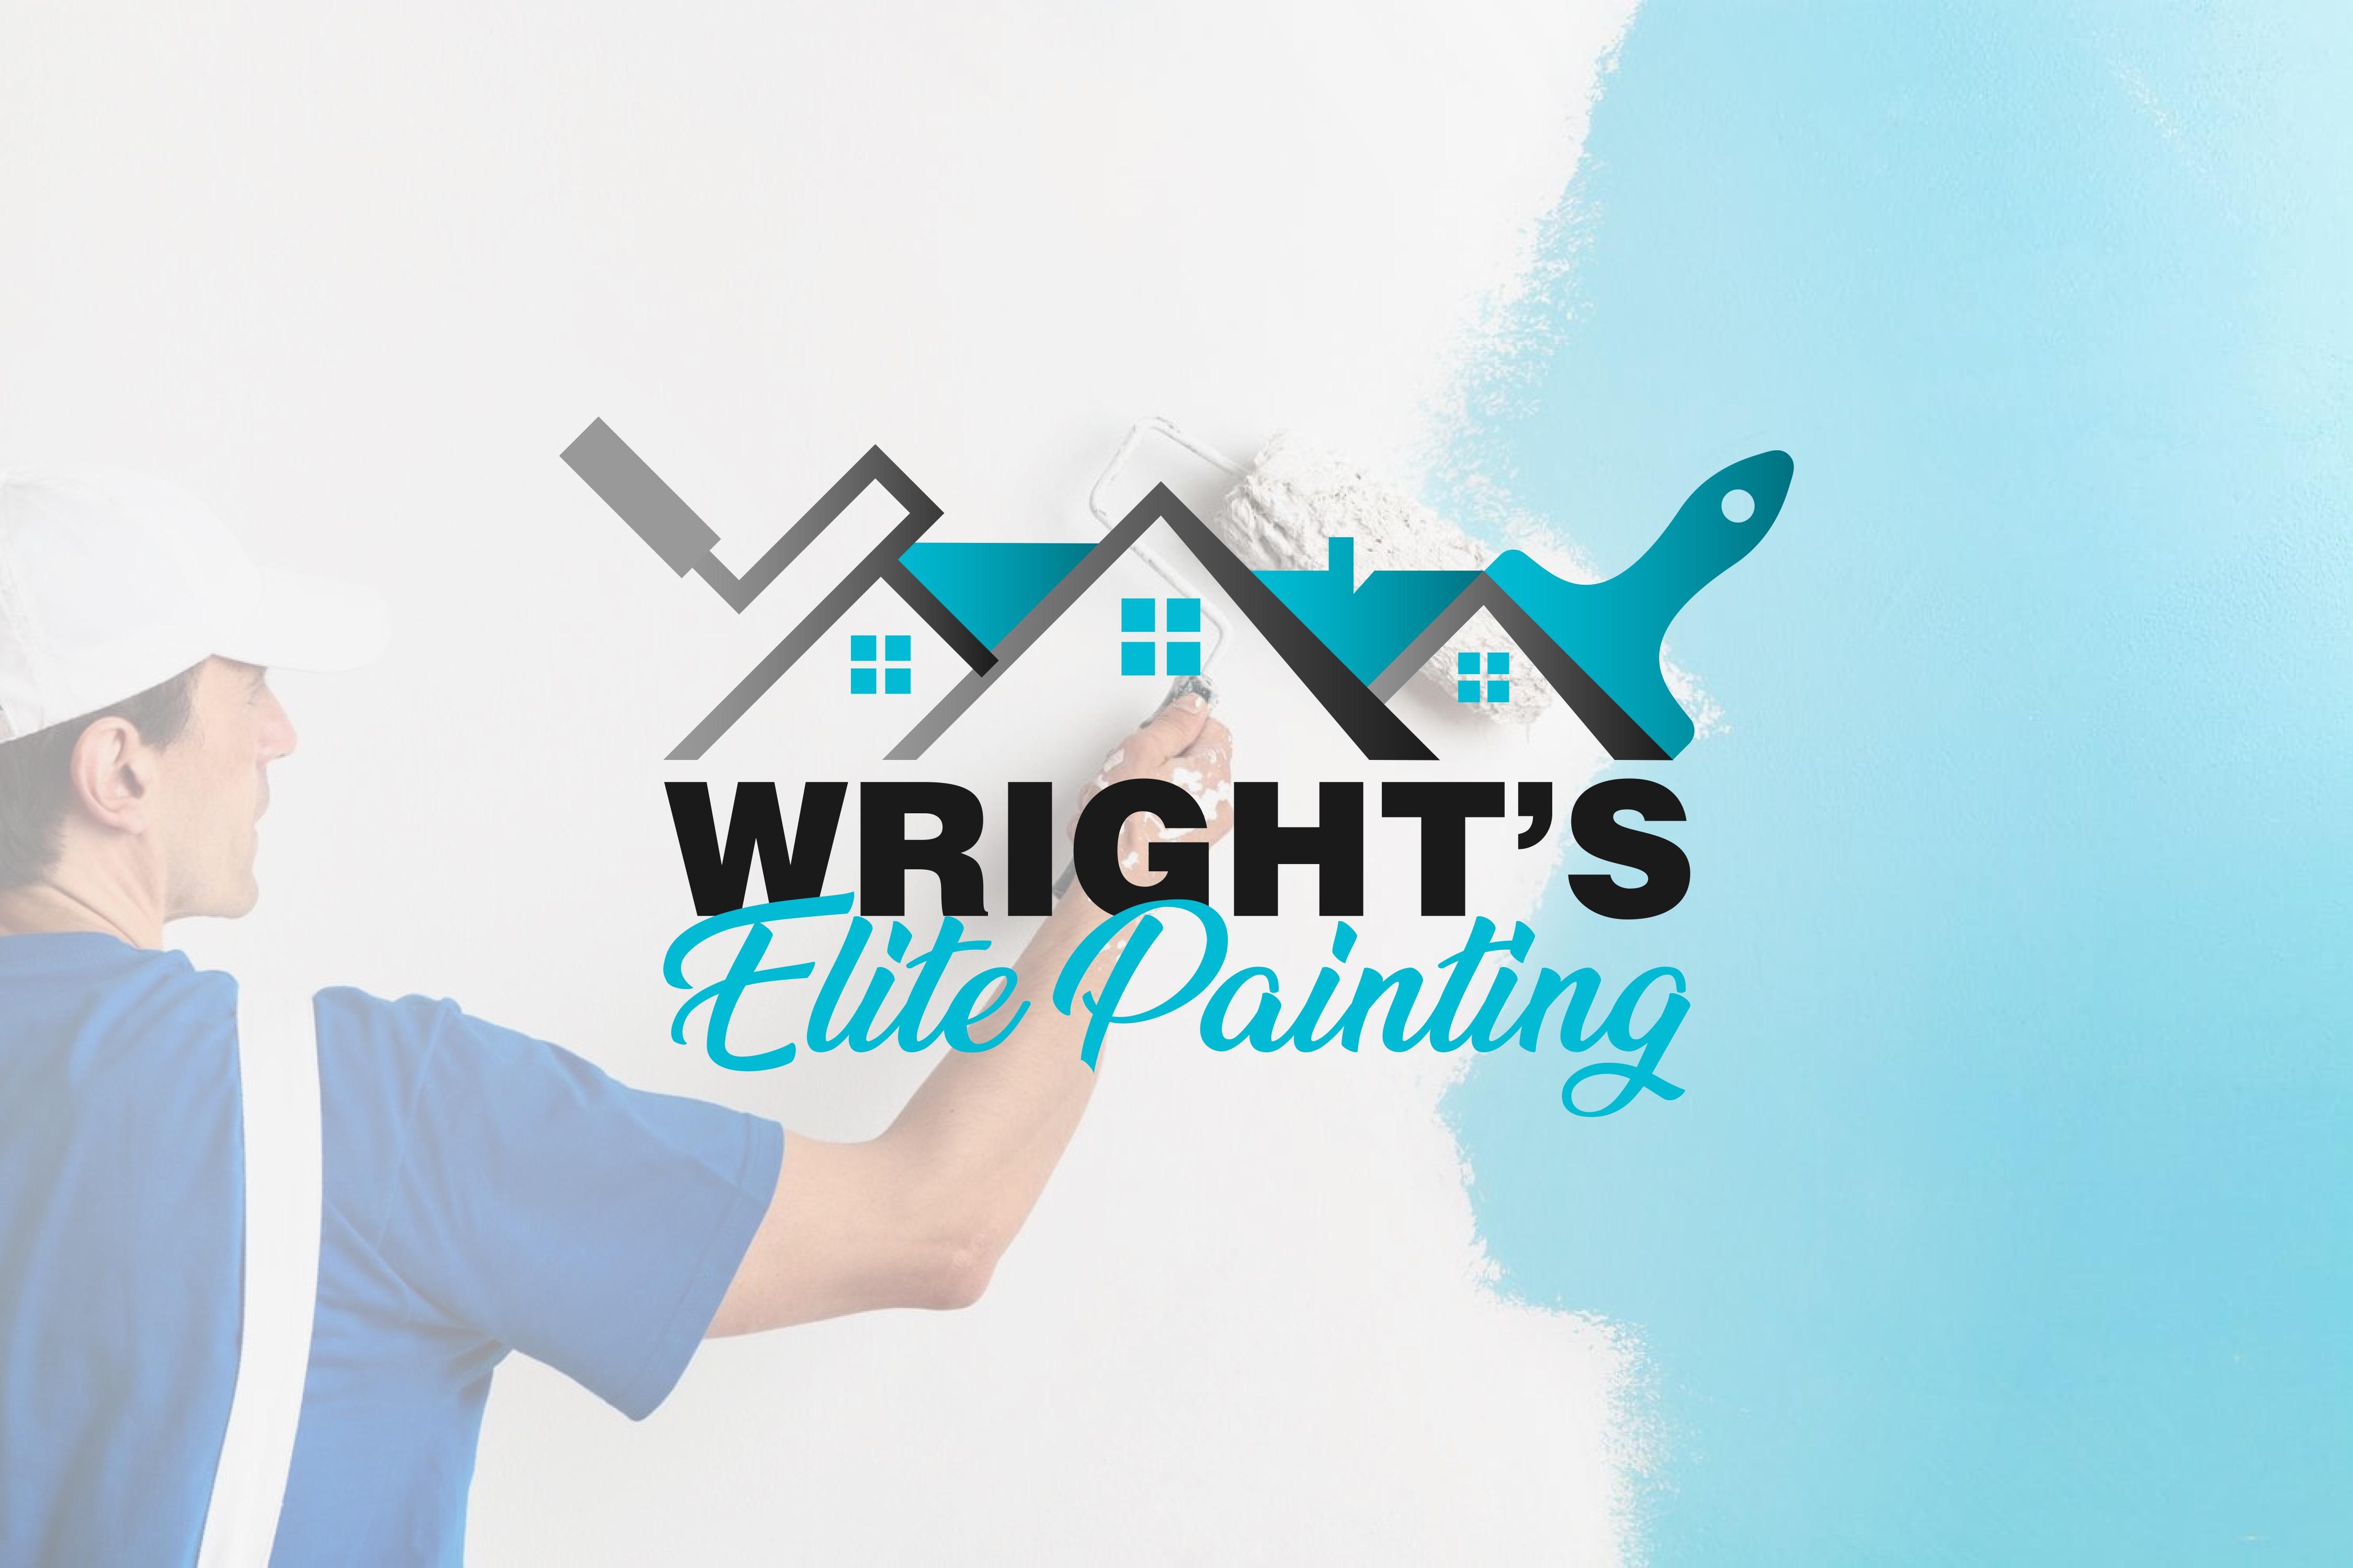 Wright's Elite Painting Business Logo